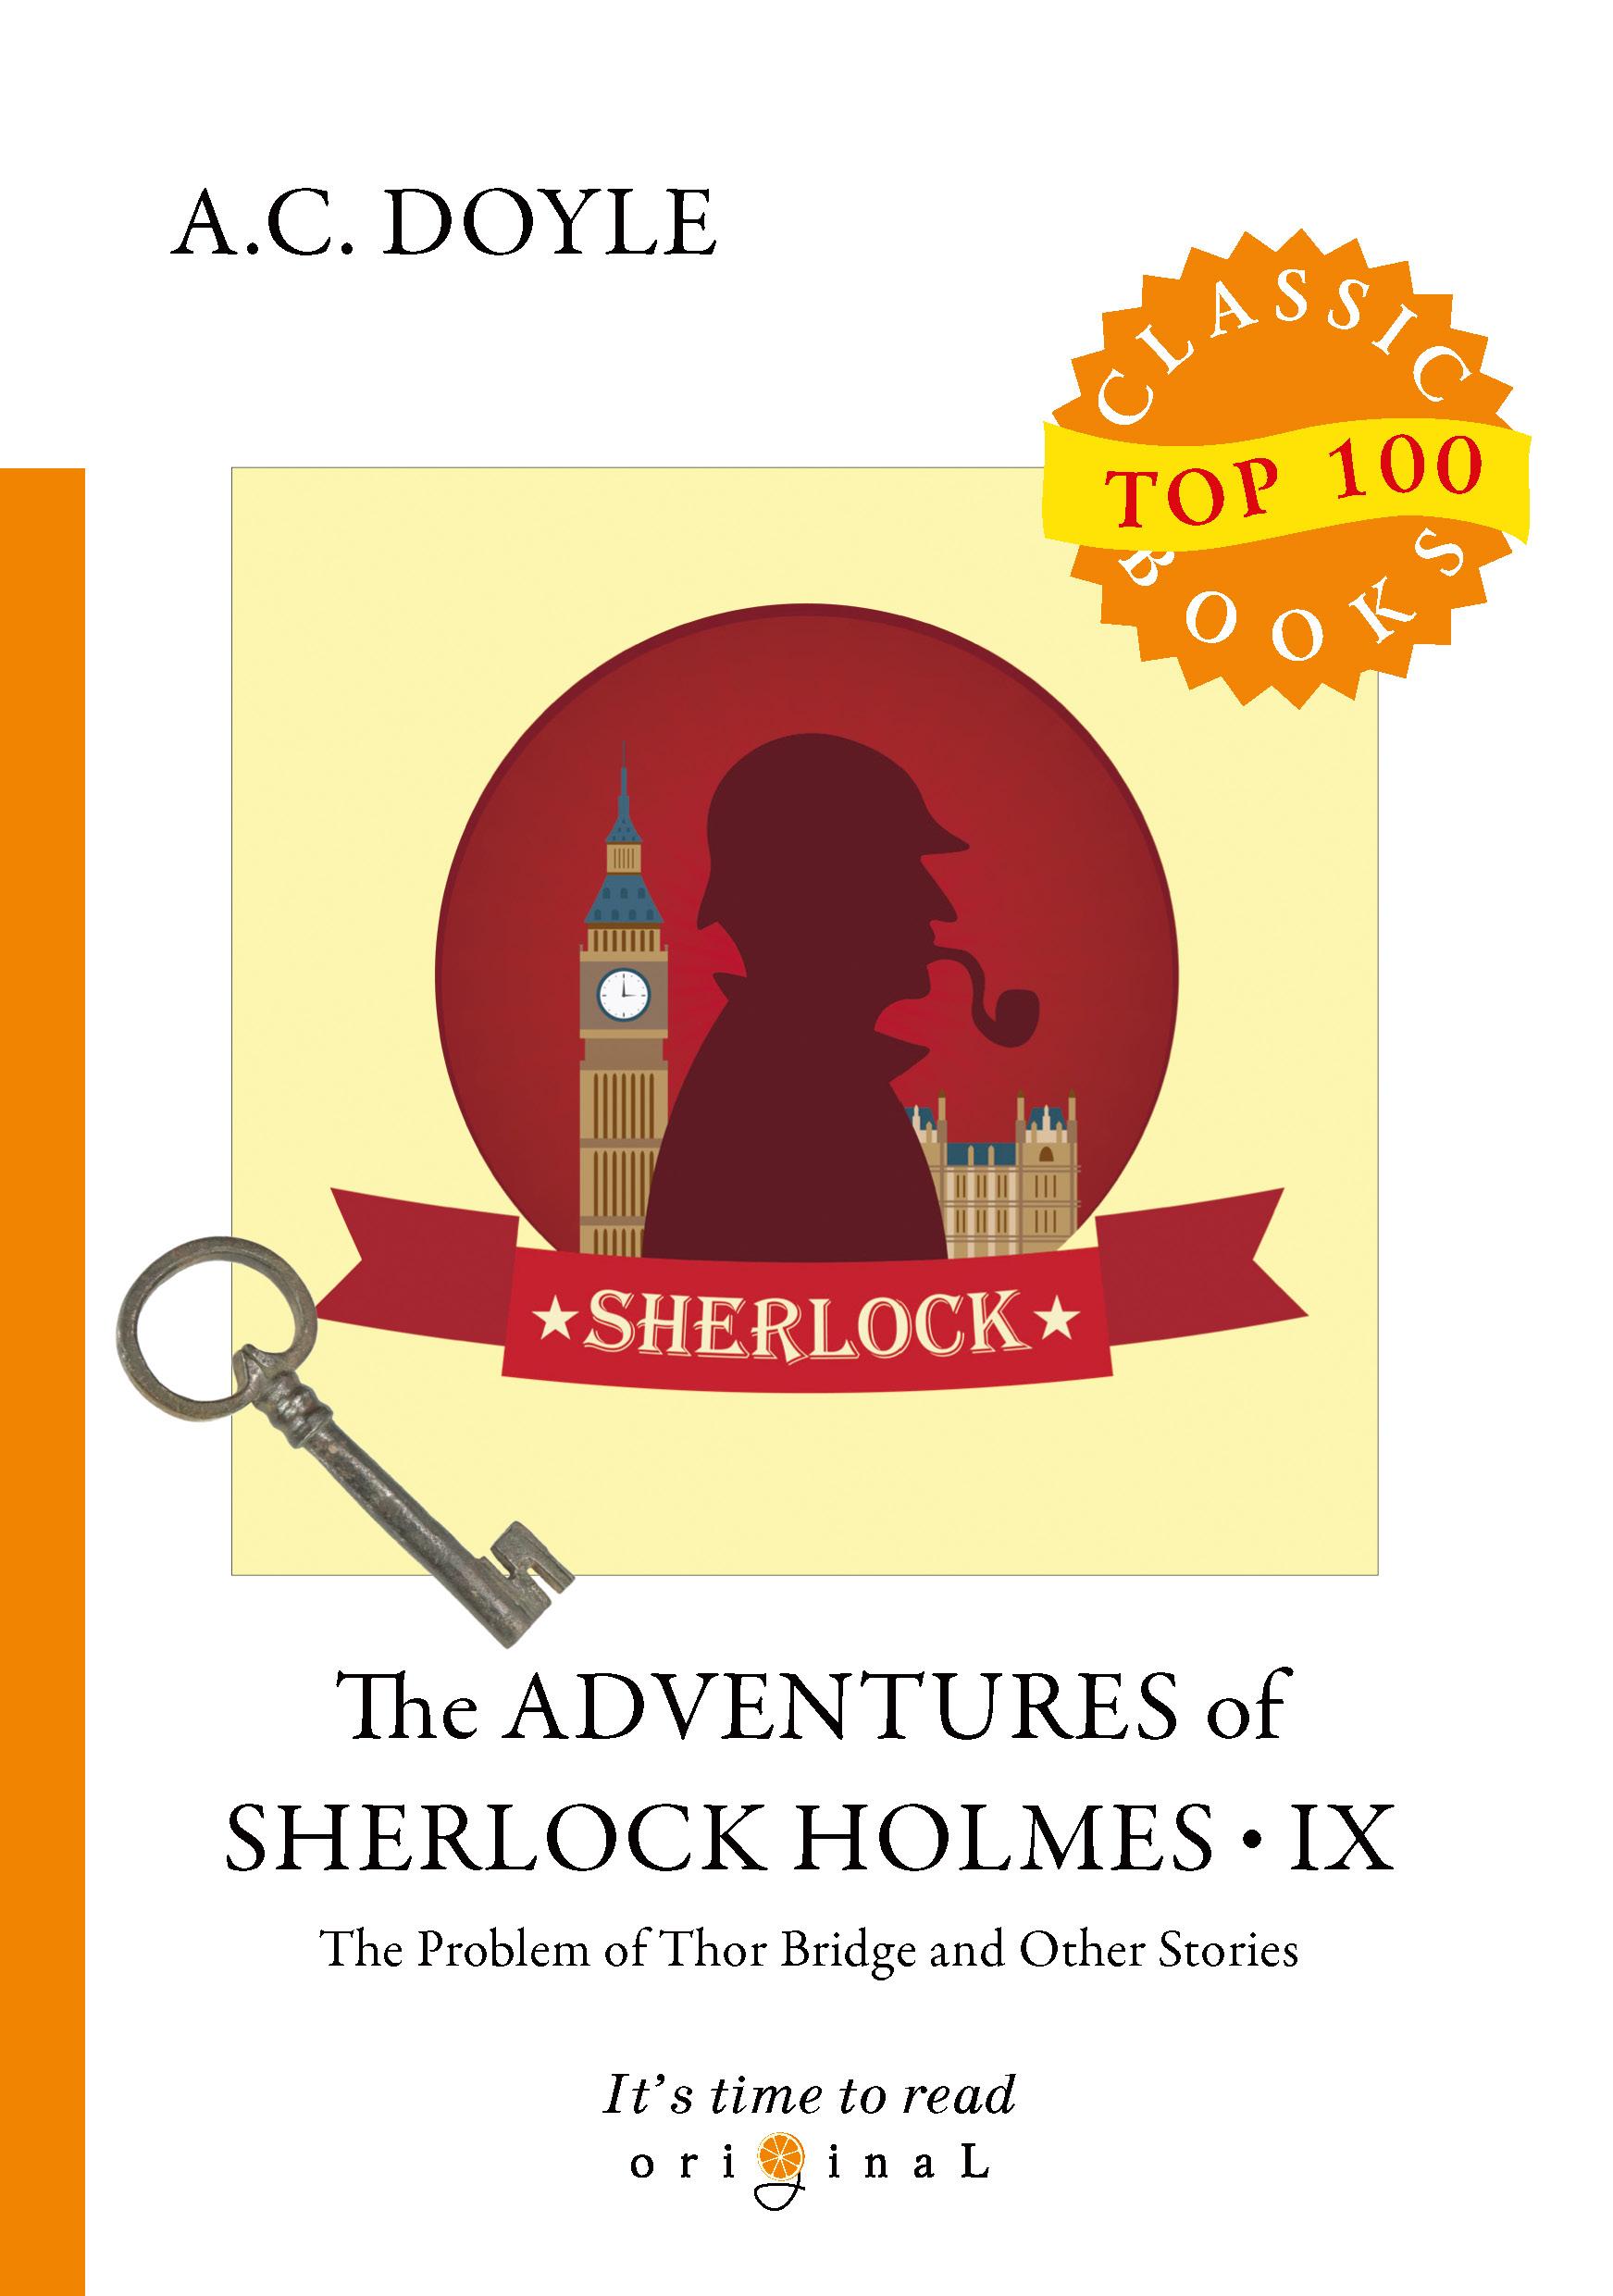 A. C. Doyle The Adventures of Sherlock Holmes IX